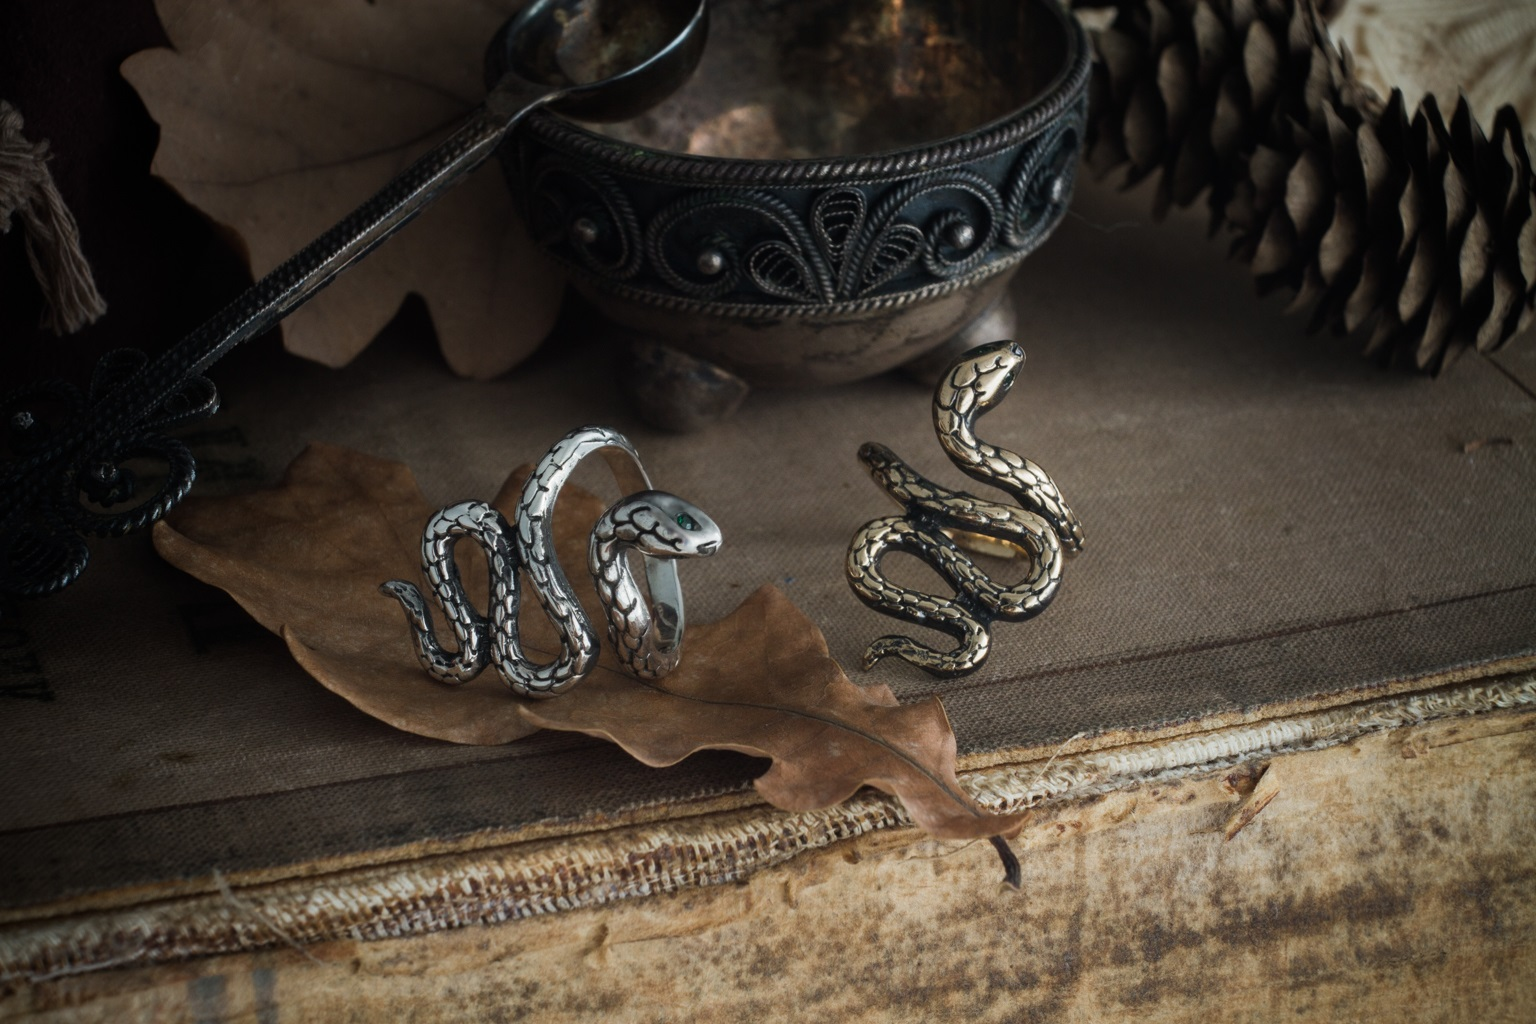 Merch Viper Ring Snake Mystic Serpent Art